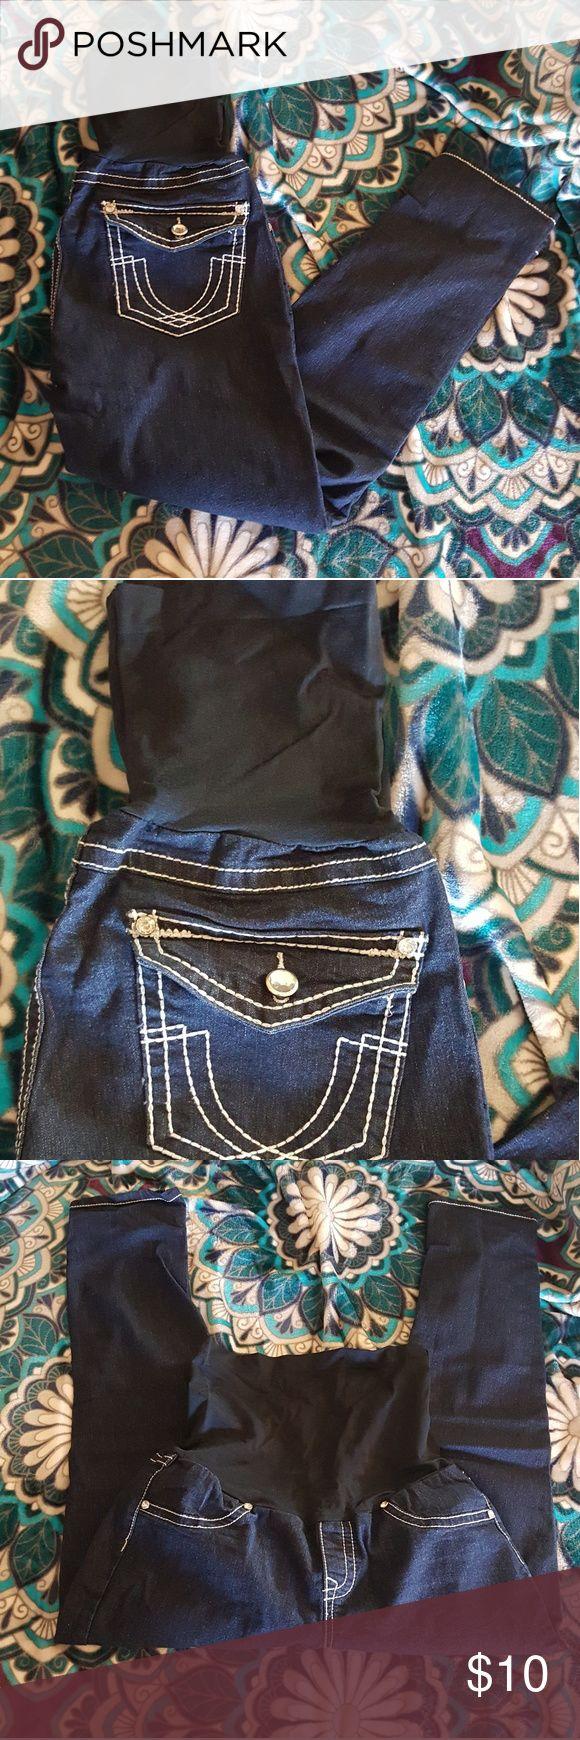 Bella Vida Maternity Jeans Belle Vida Maternity Jeans Skinny Jeans Stretchy top Size L Bella vida Pants